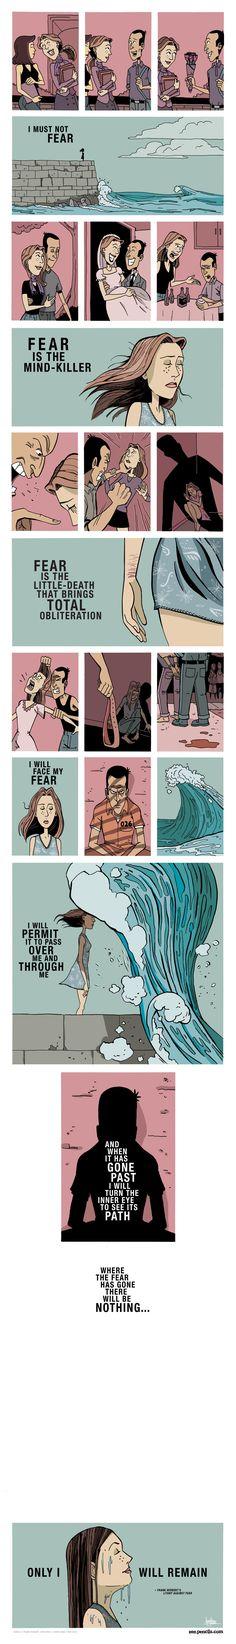 ZEN PENCILS - 17. FRANK HERBERT: Litany against fear